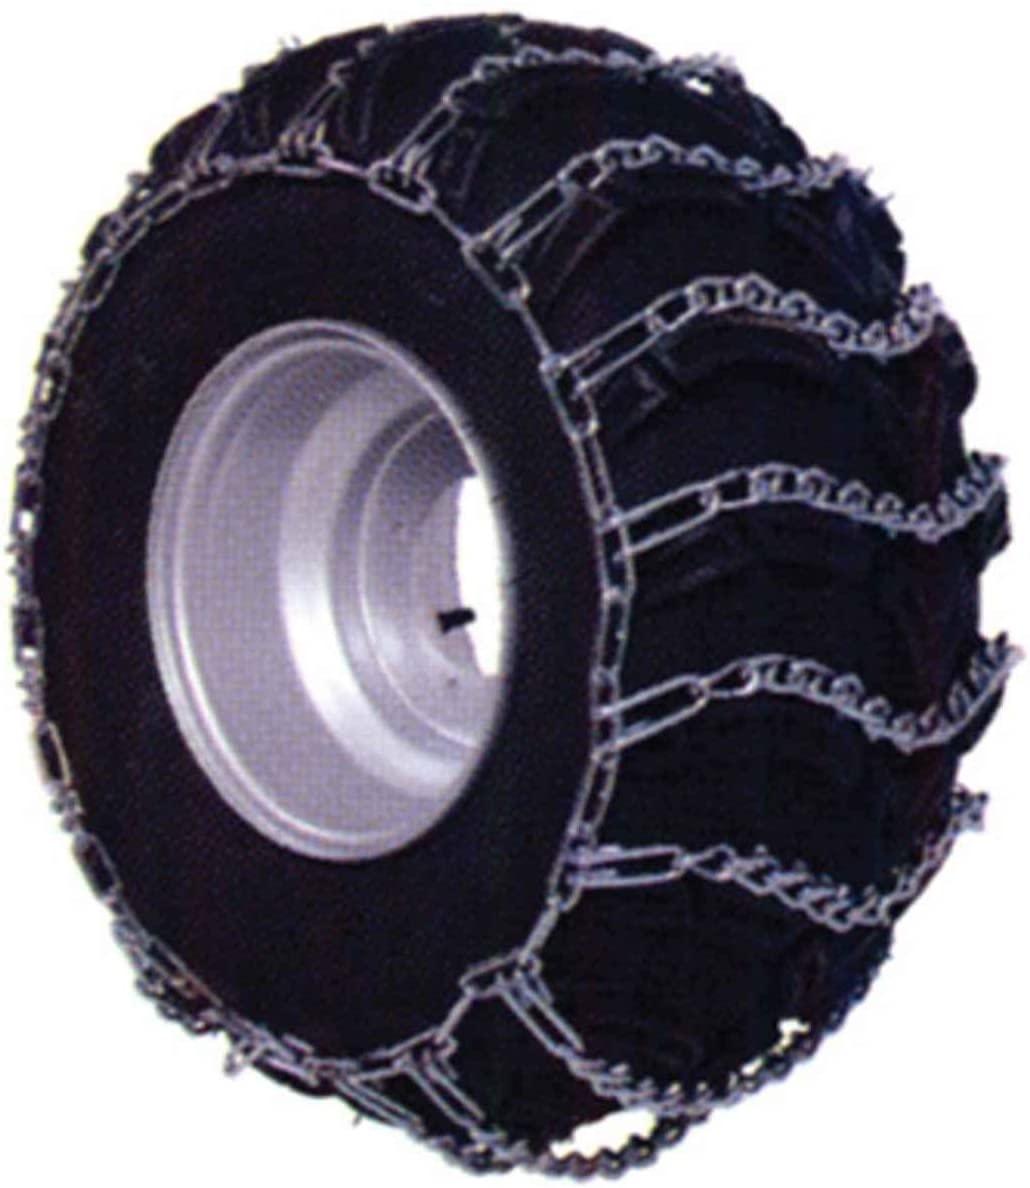 WALLINGFORD V-BAR Chains 51